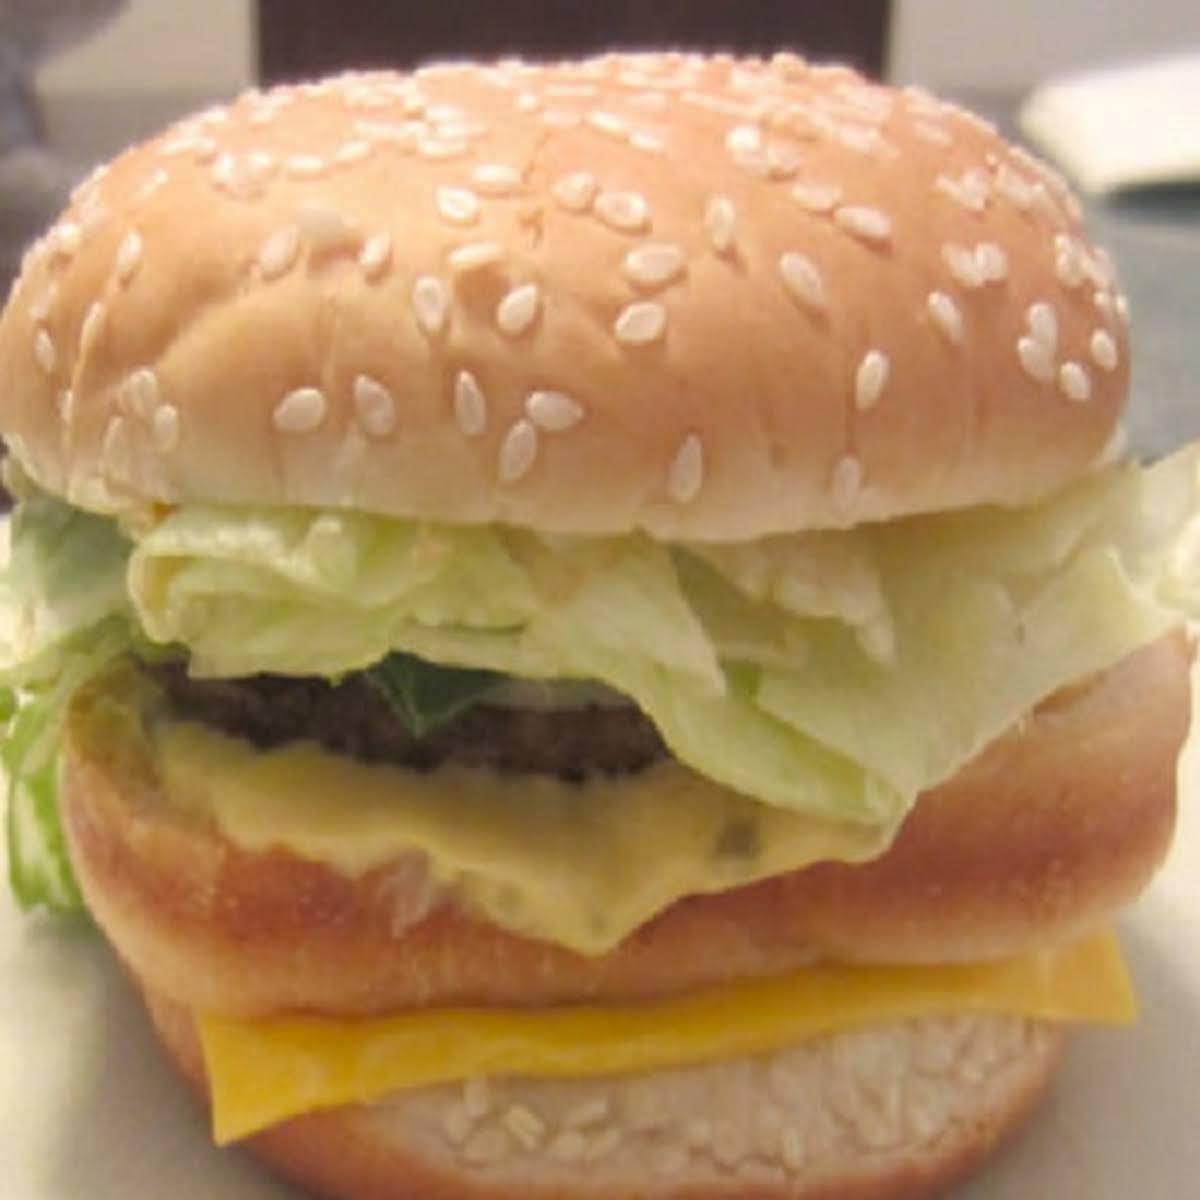 Burger King Big King Burger